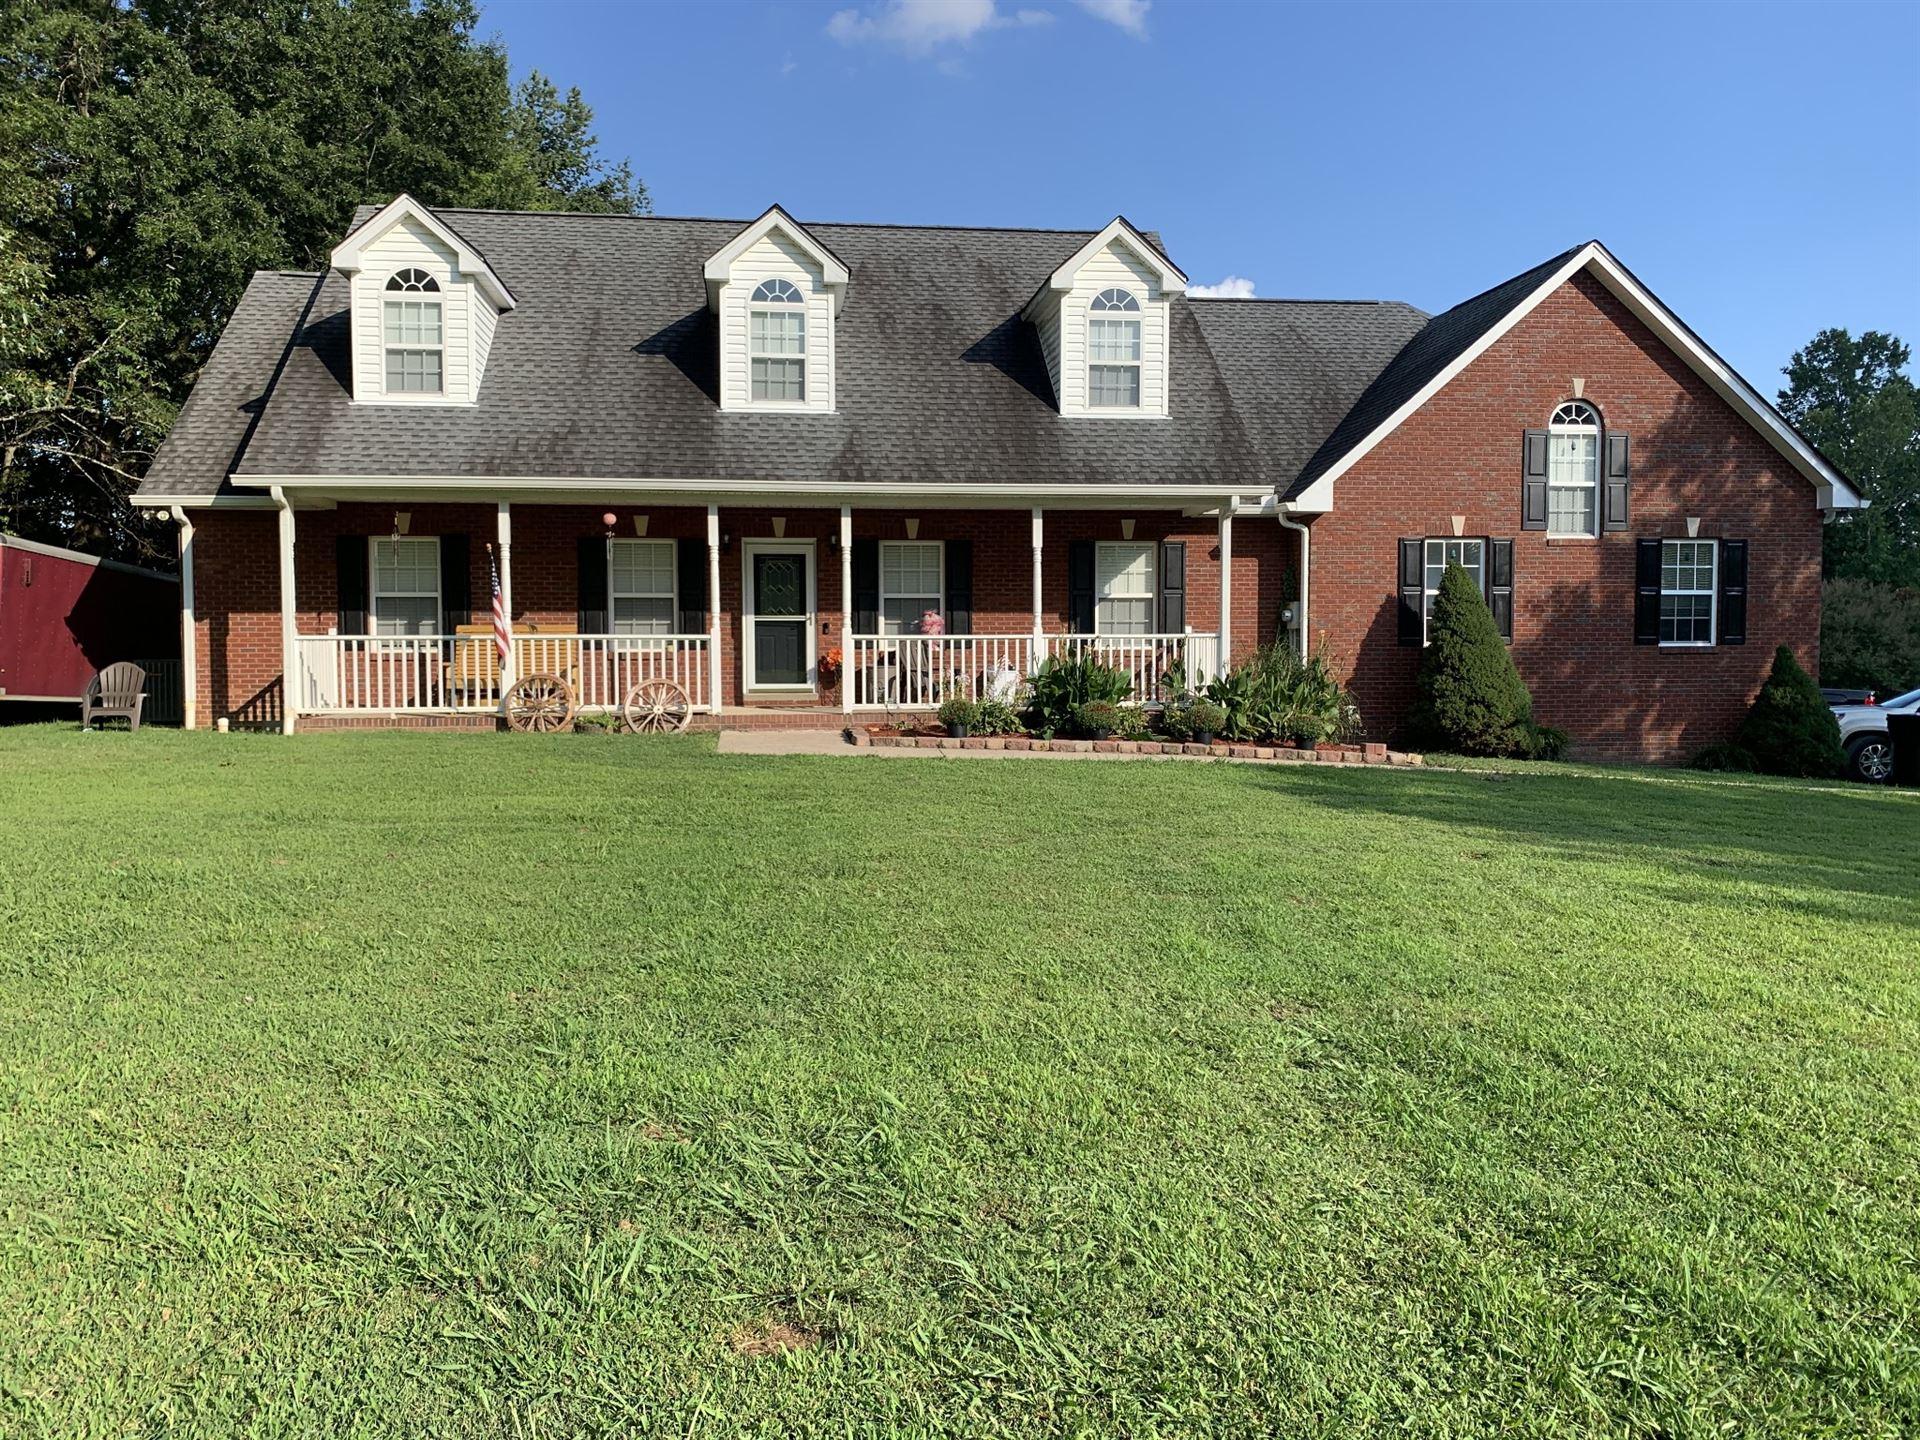 1019 Autumn Woods Dr, Pleasant View, TN 37146 - MLS#: 2183065